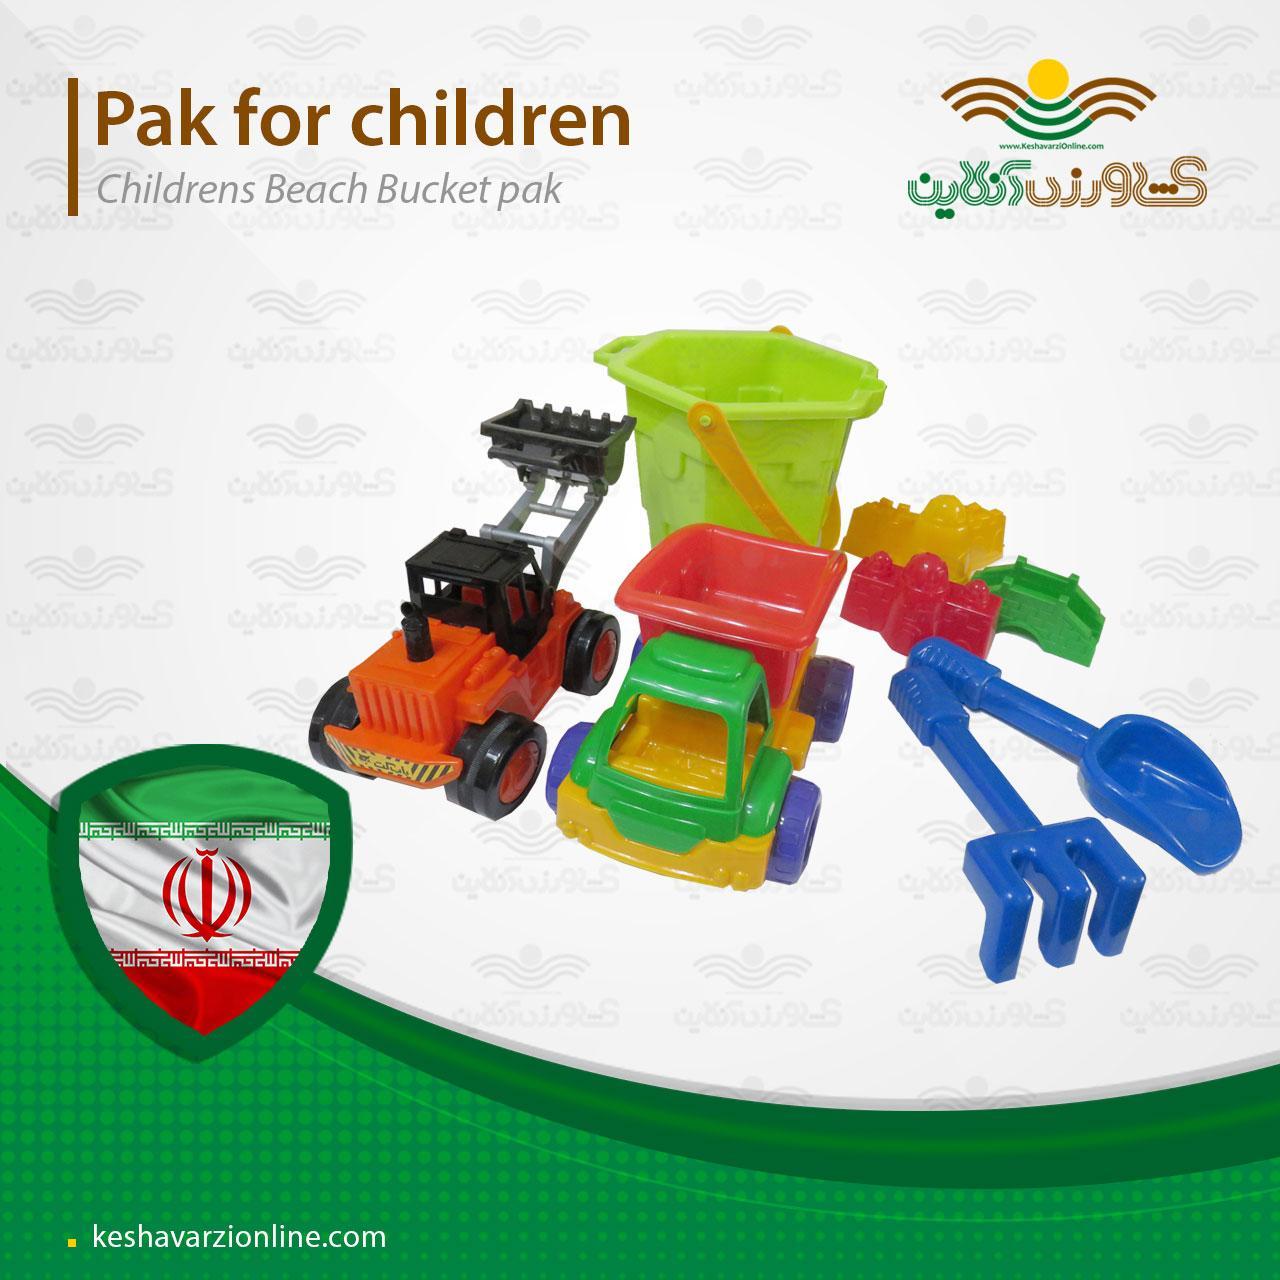 اسباب بازی ساحلی پک کامل سطلی کودک